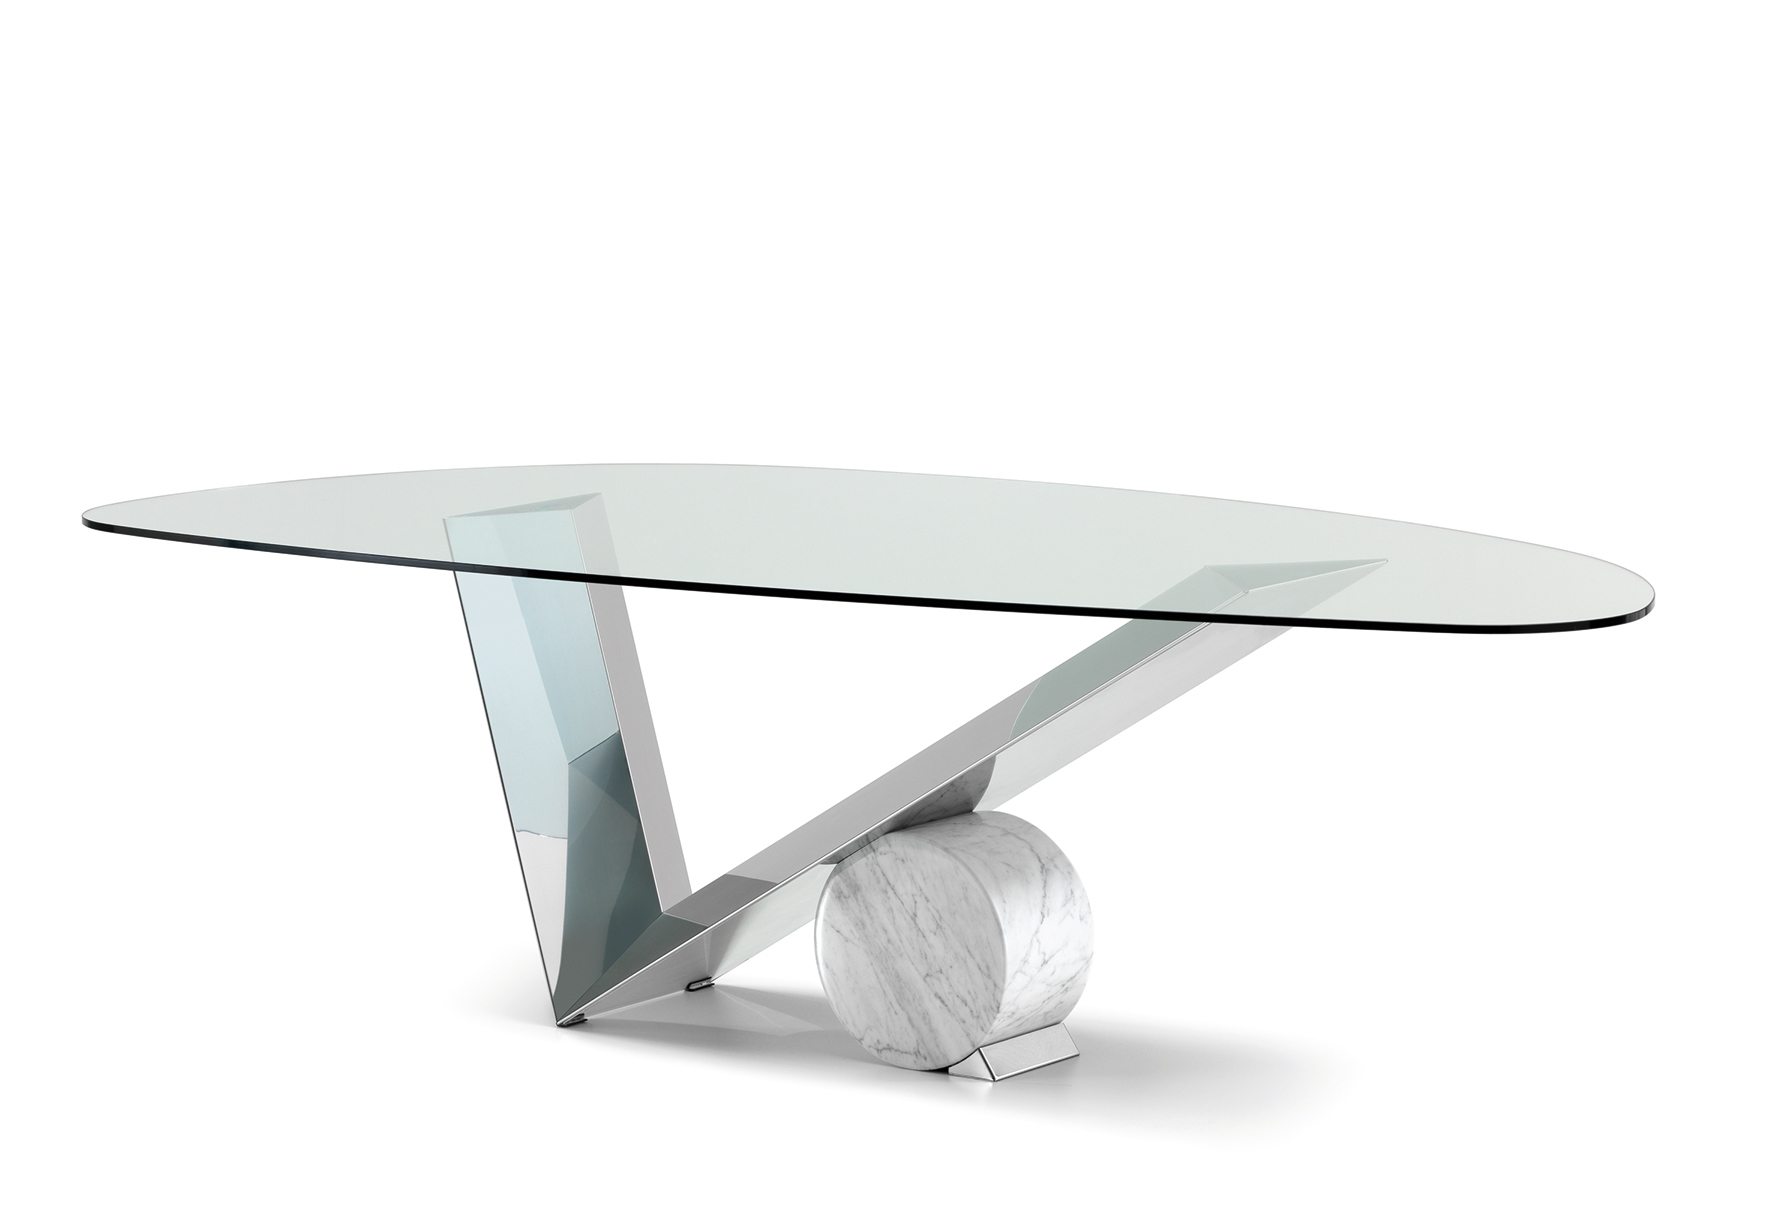 tavoli consolle cattelan: sedia margot cattelan italia. - Tavolino Design Gambe Legno Atari Cattelan